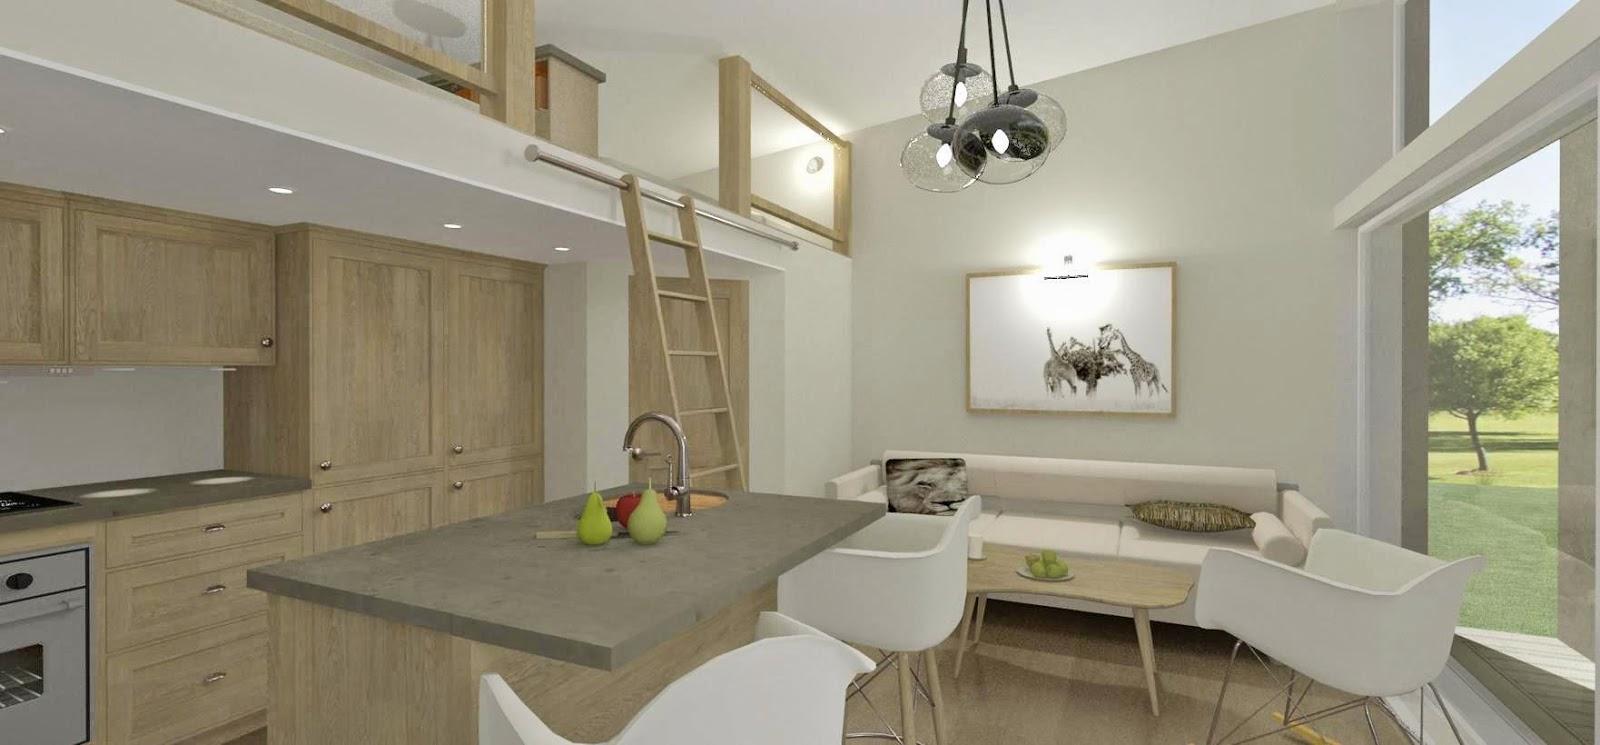 Dreams & Coffees arkitekt- och projektblogg: juli 2014